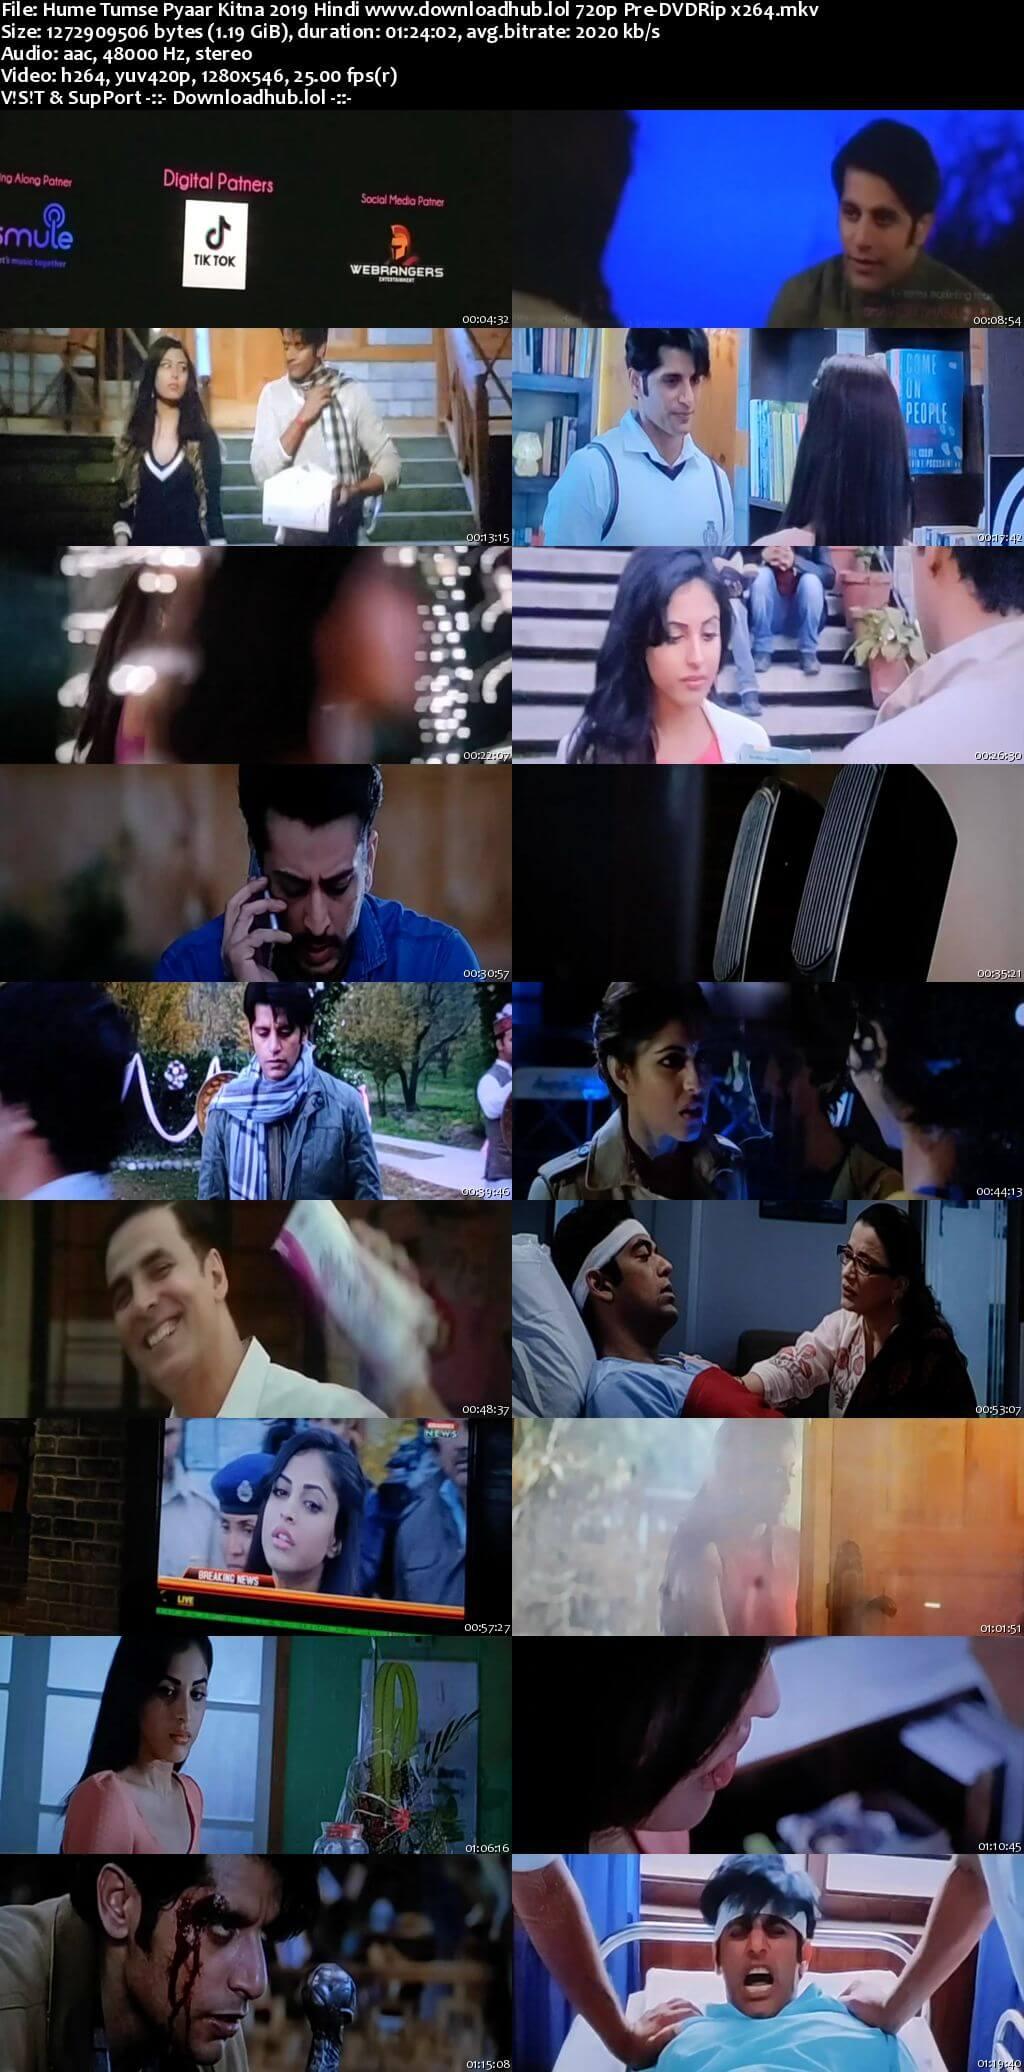 Hume Tumse Pyaar Kitna 2019 Hindi 720p Pre-DVDRip x264